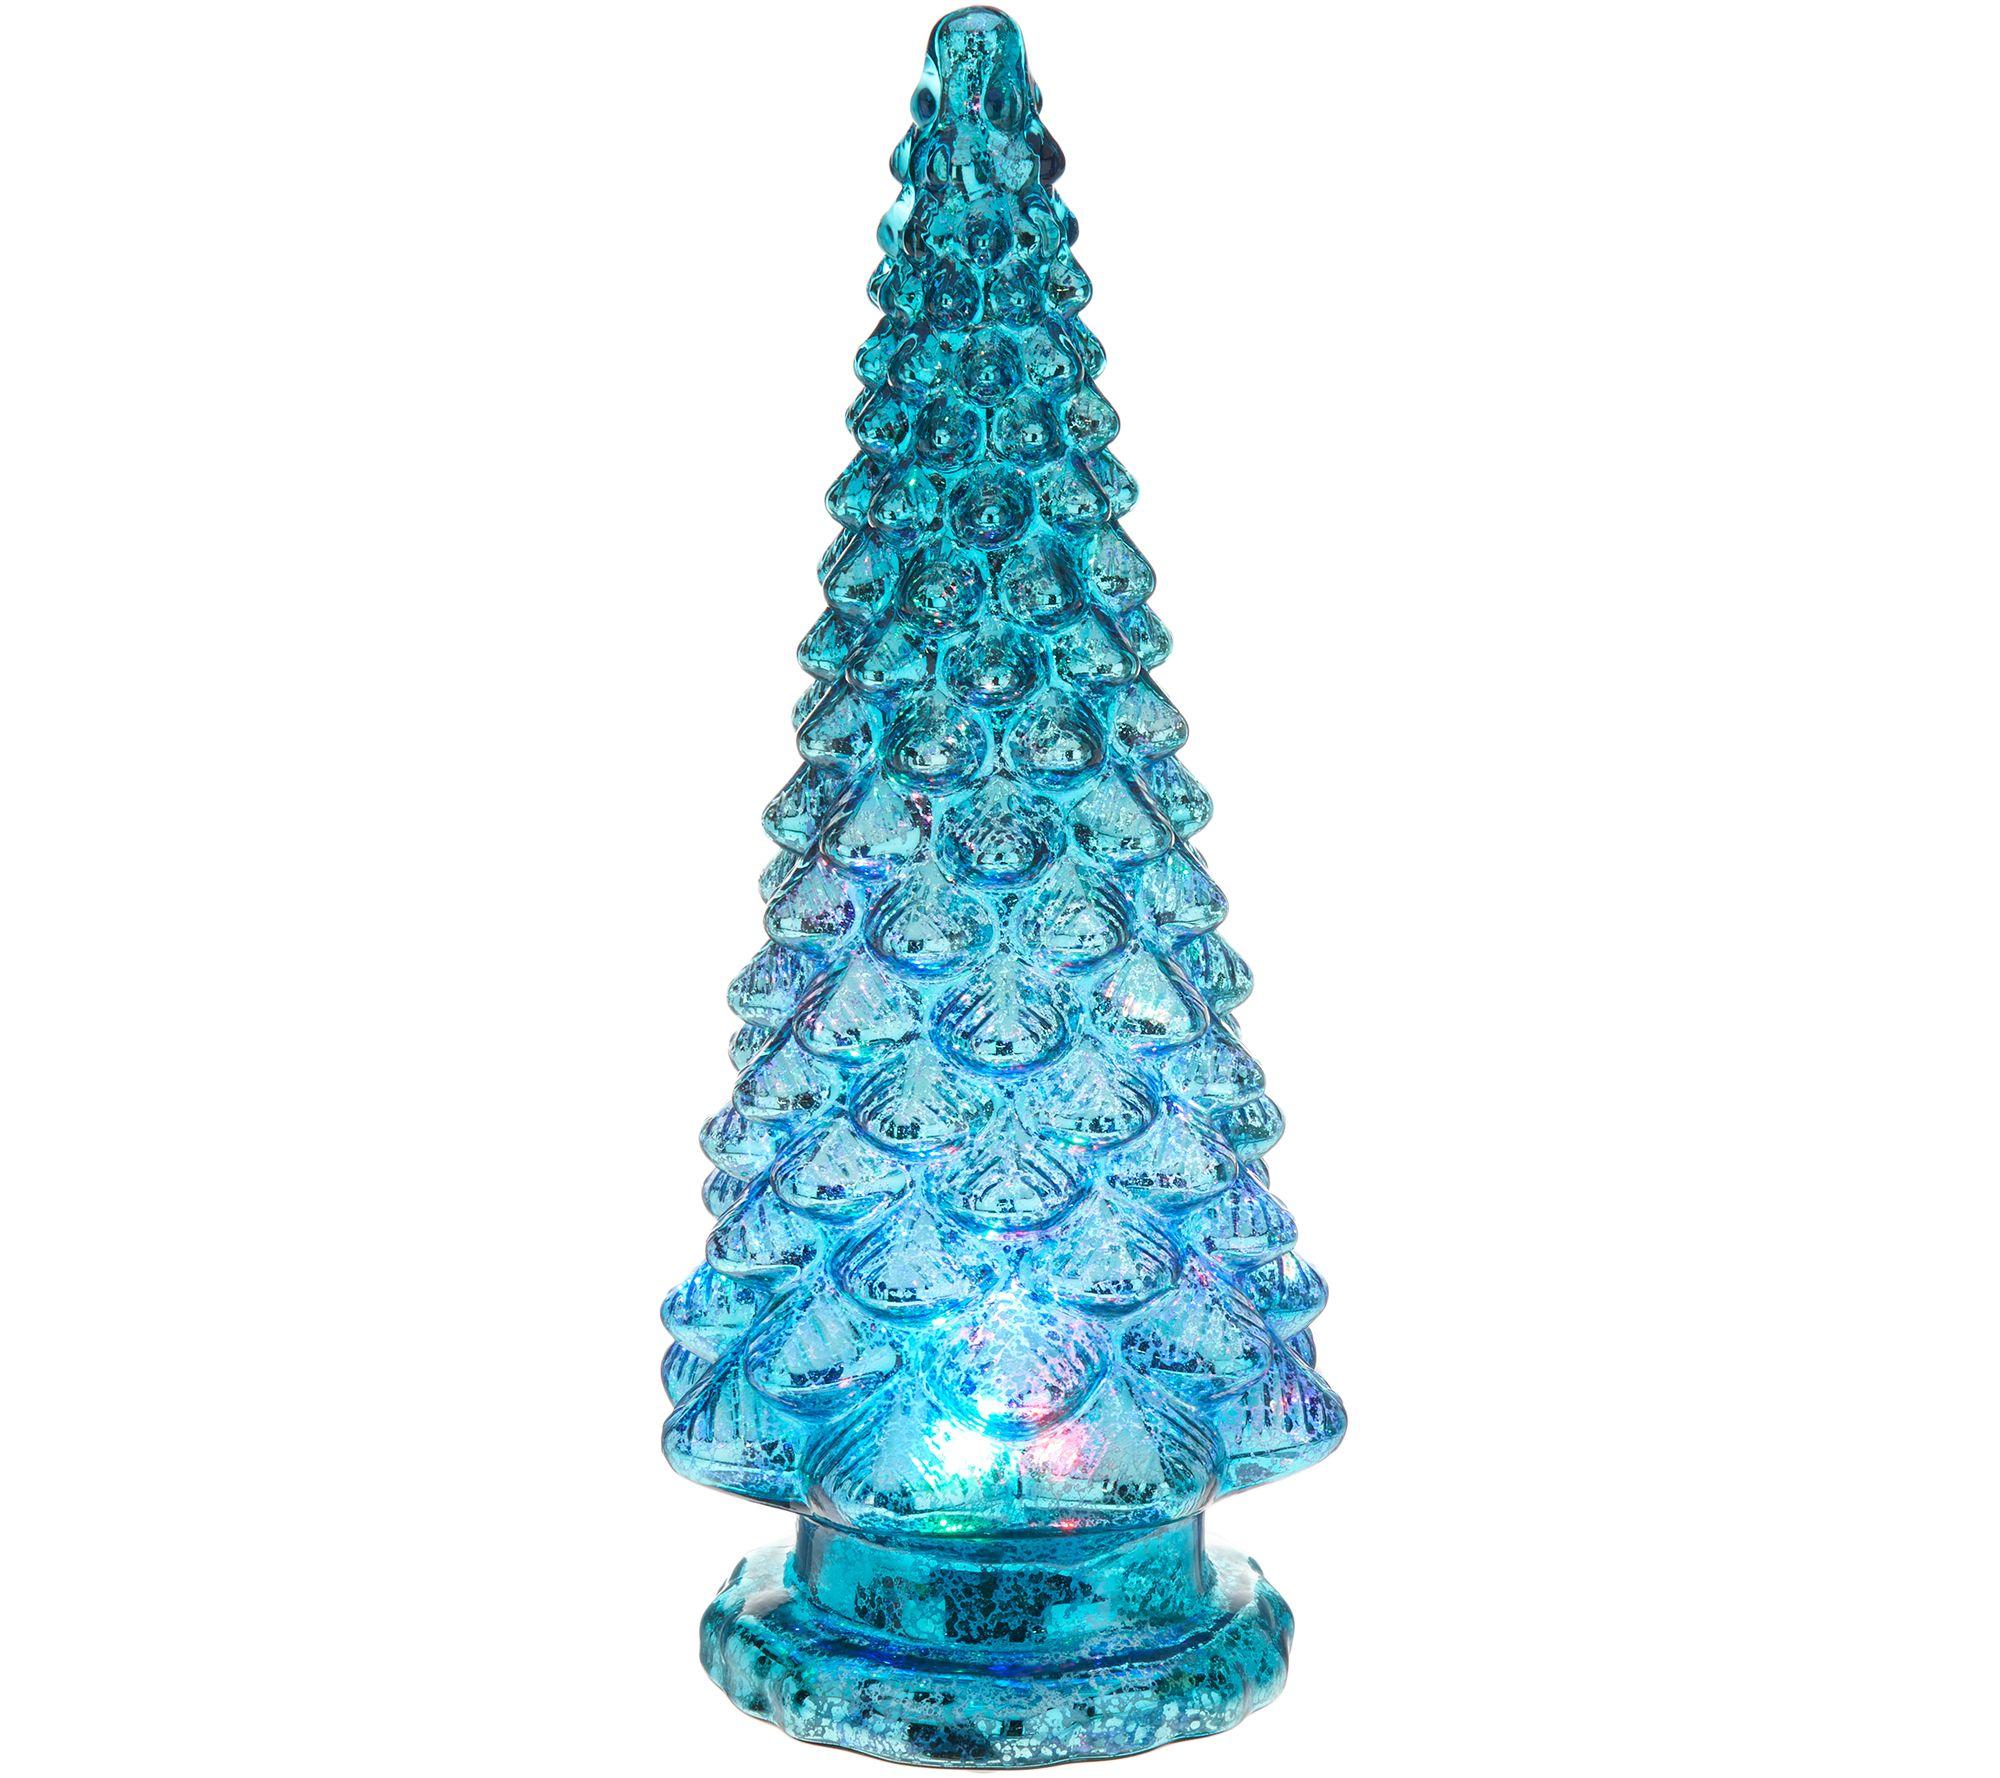 Mercury Glass Kaleidoscope Light Show 16 Tree By Valerie Page 1 Qvc Com